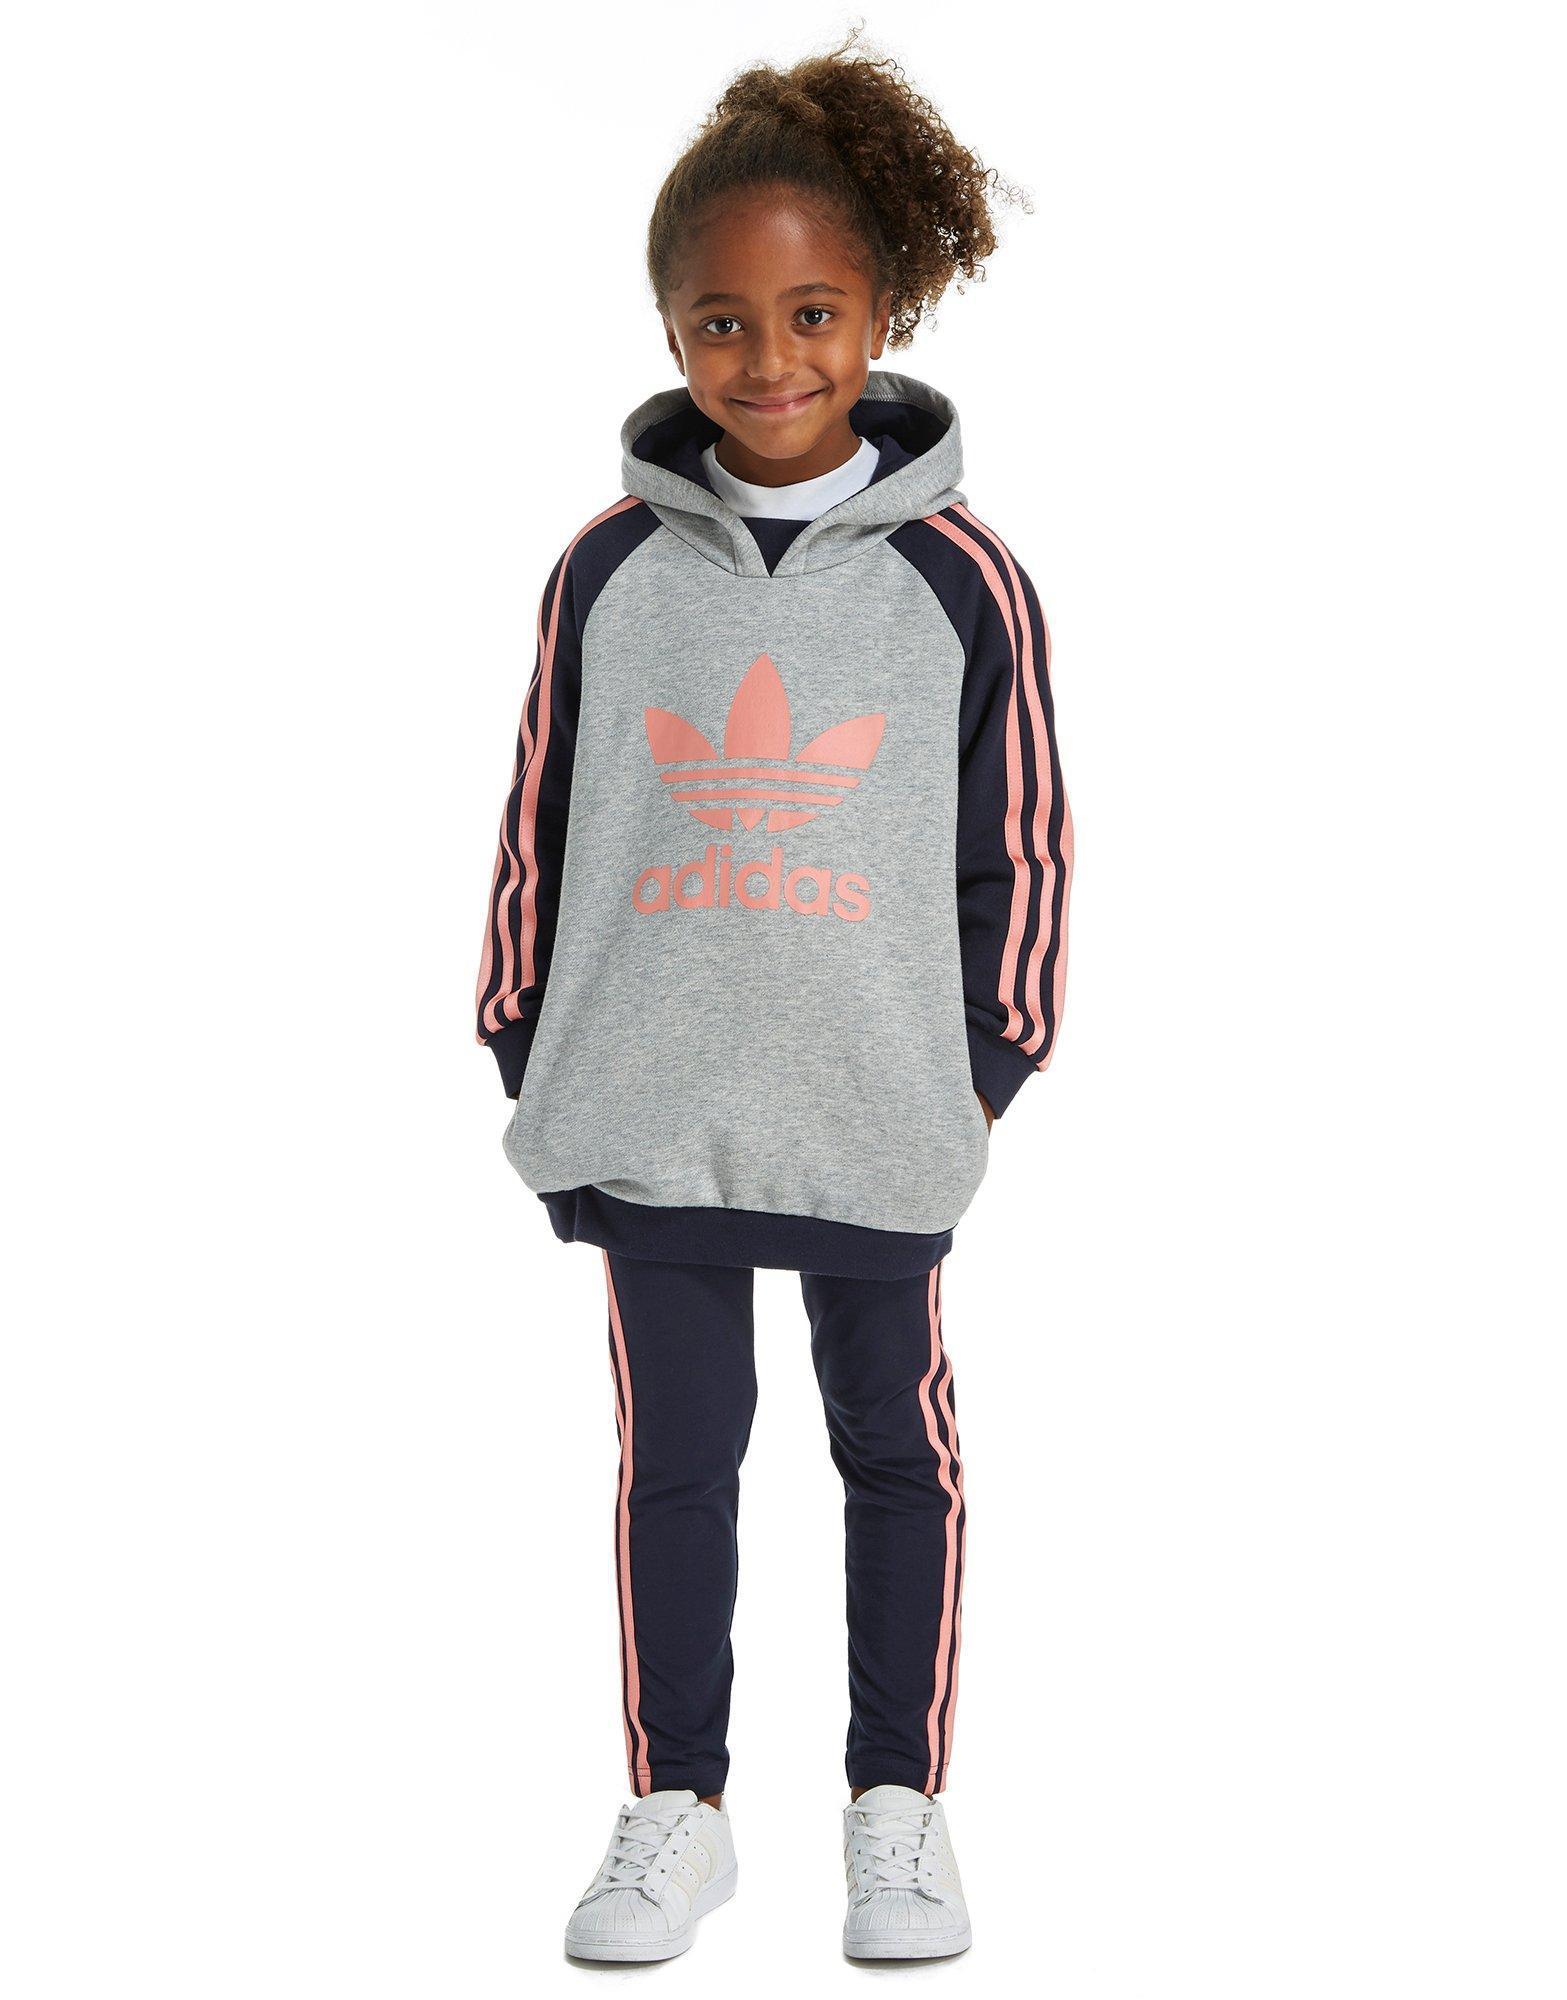 082b46e9713bf adidas Originals Girls' Hoodie & Legging Set Children in Gray - Lyst